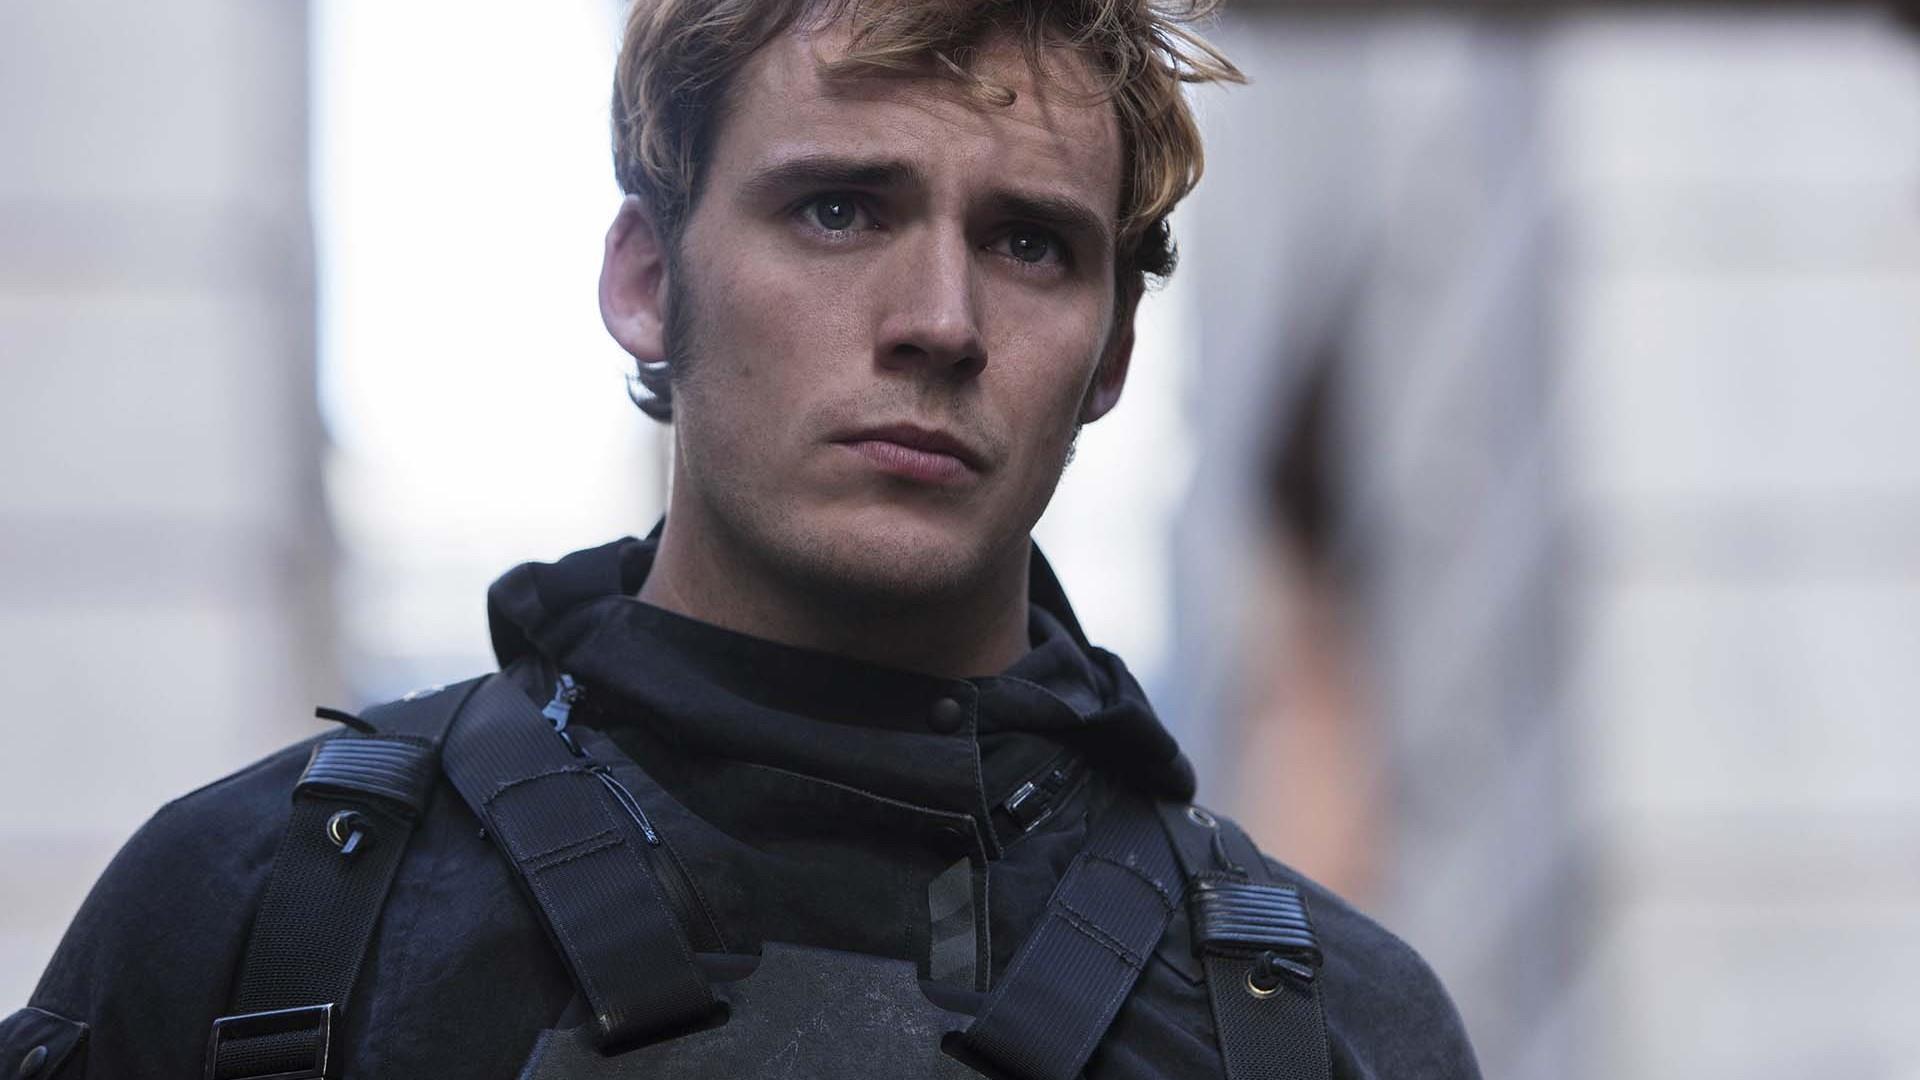 Sam Claflin The Hunger Games